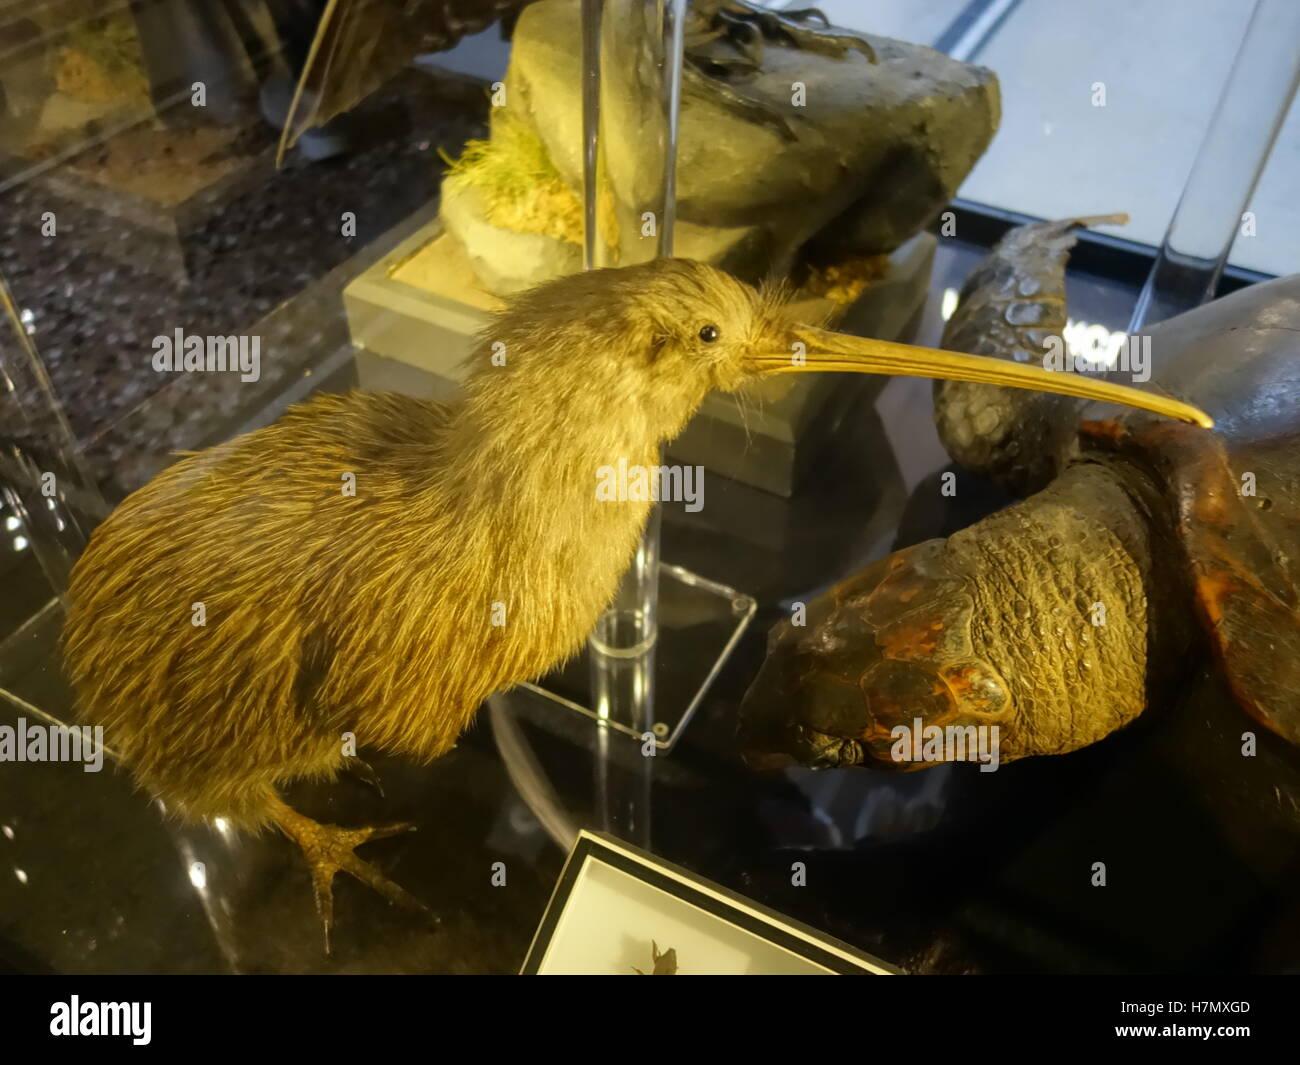 Taxidermy Kiwi bird in a museum - Stock Image